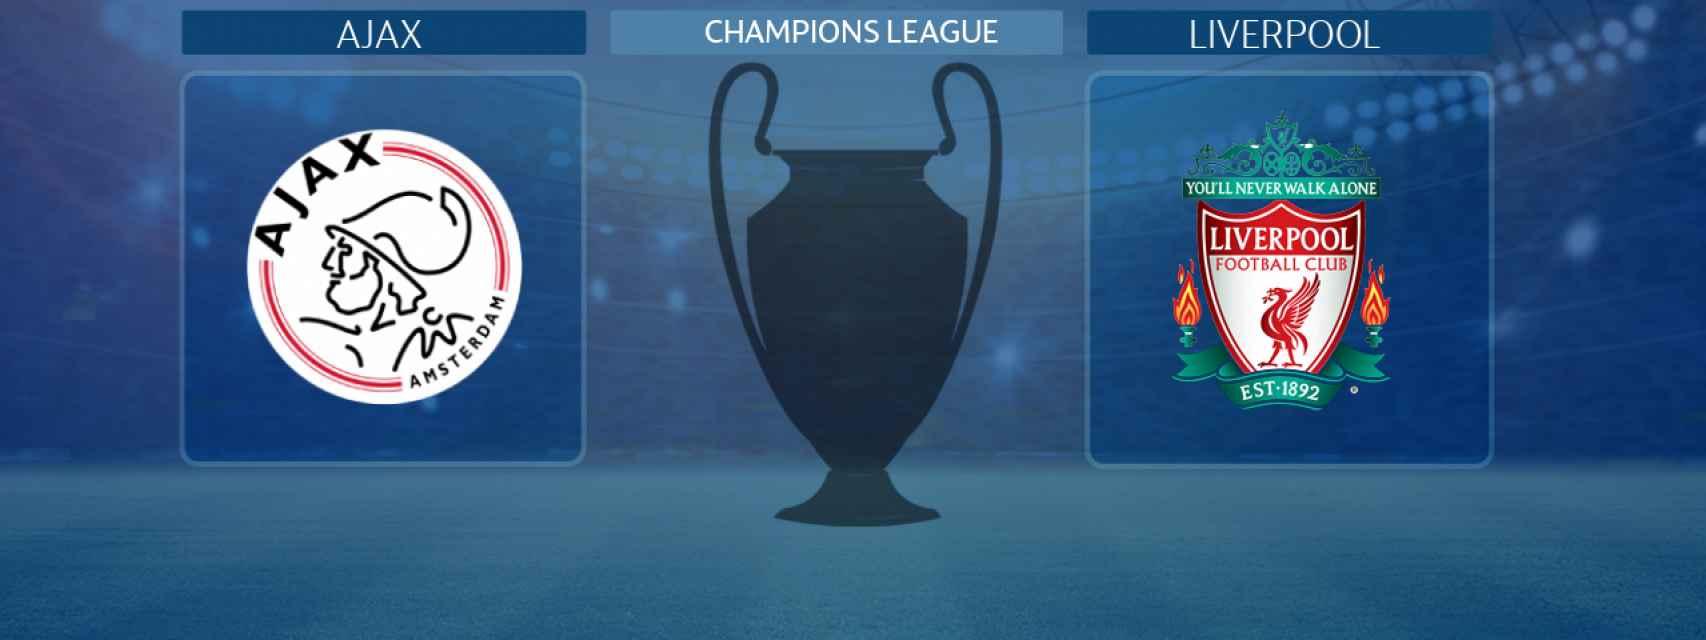 Ajax - Liverpool, partido de la Champions League